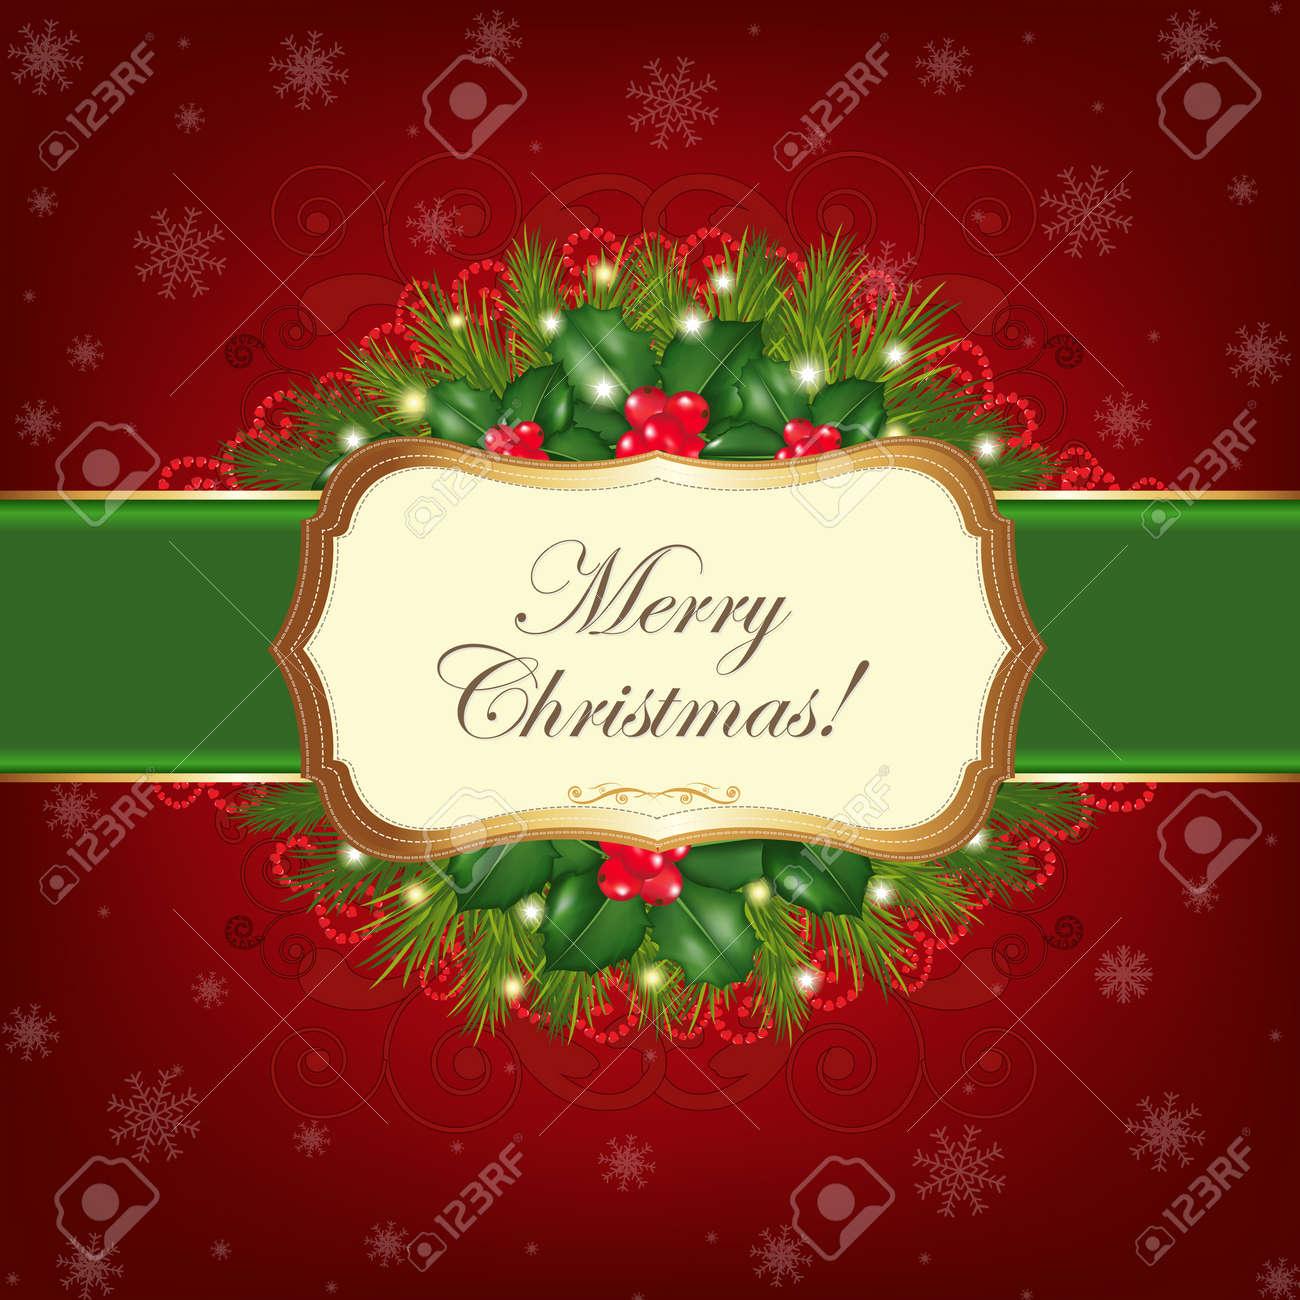 Christmas Greeting Card, Vector Illustration Stock Vector - 11309034